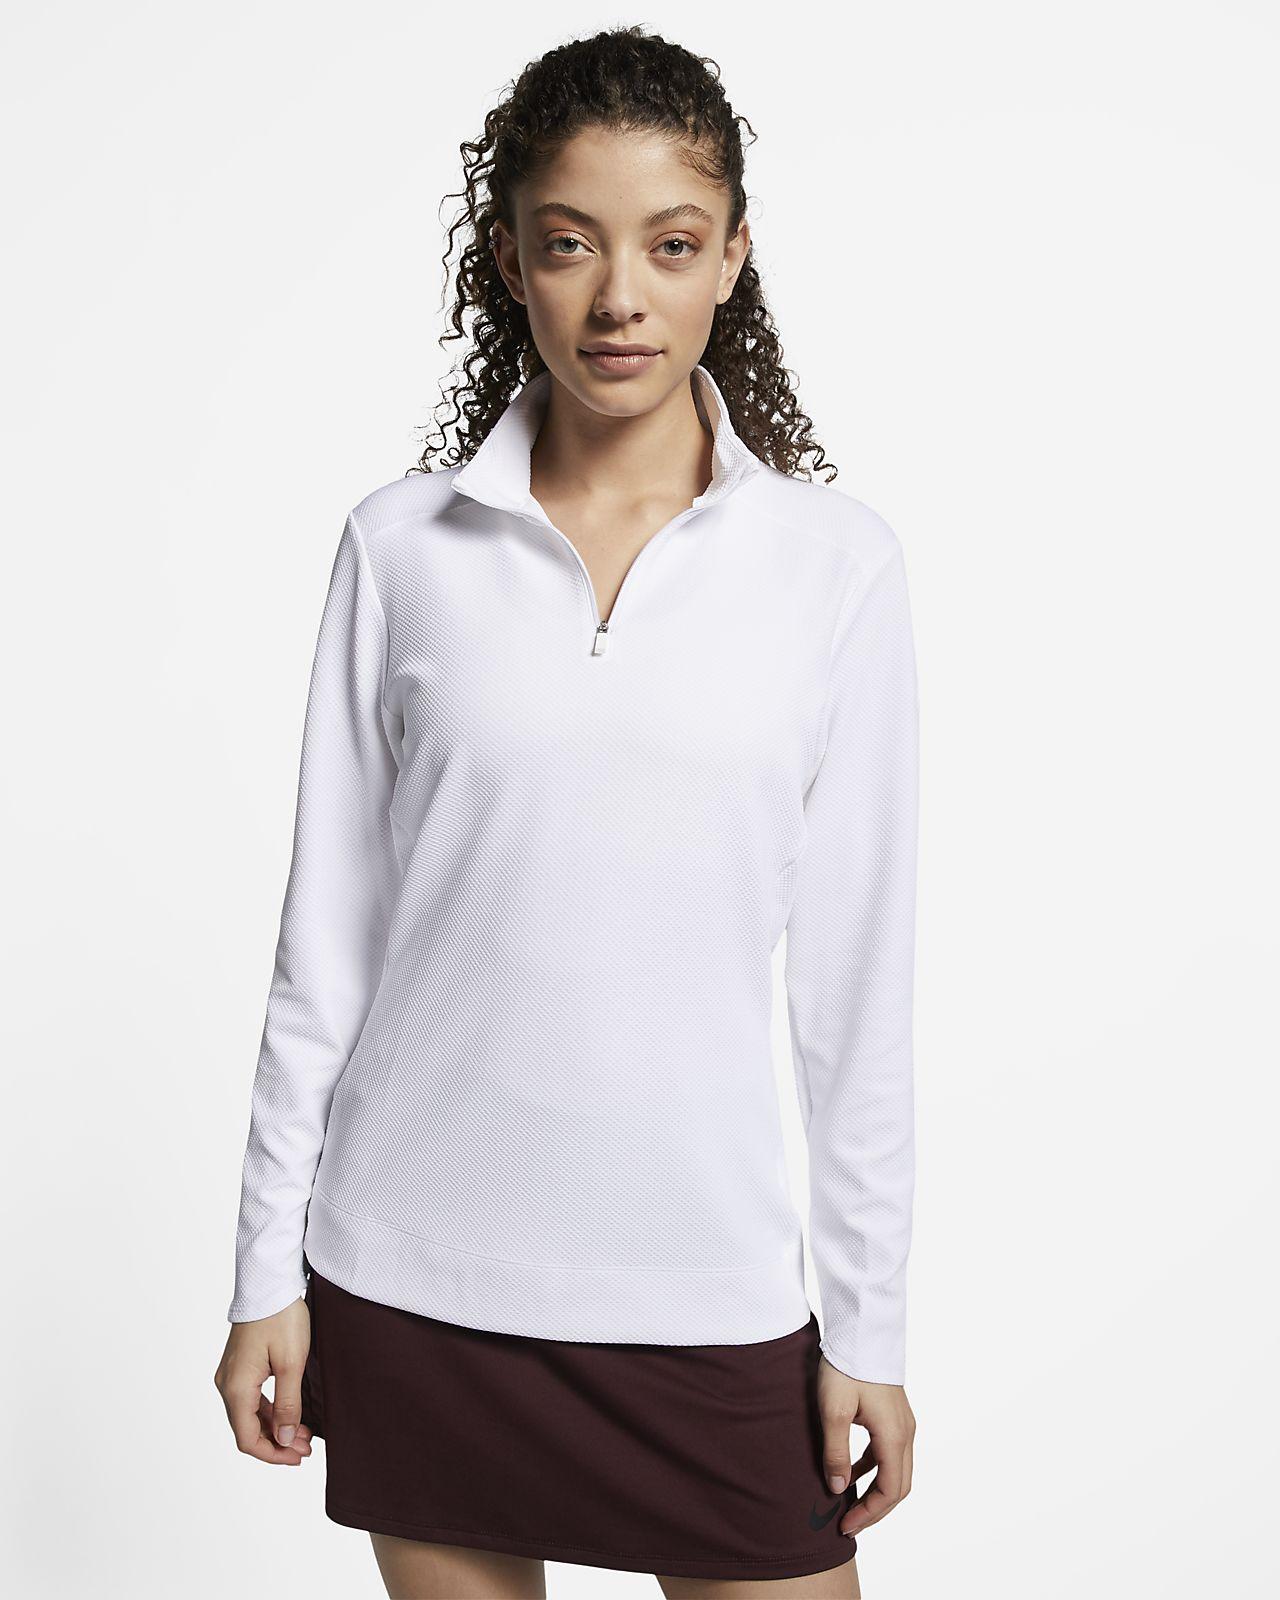 Nike Dri-FIT UV Women's 1/4-Zip Golf Top